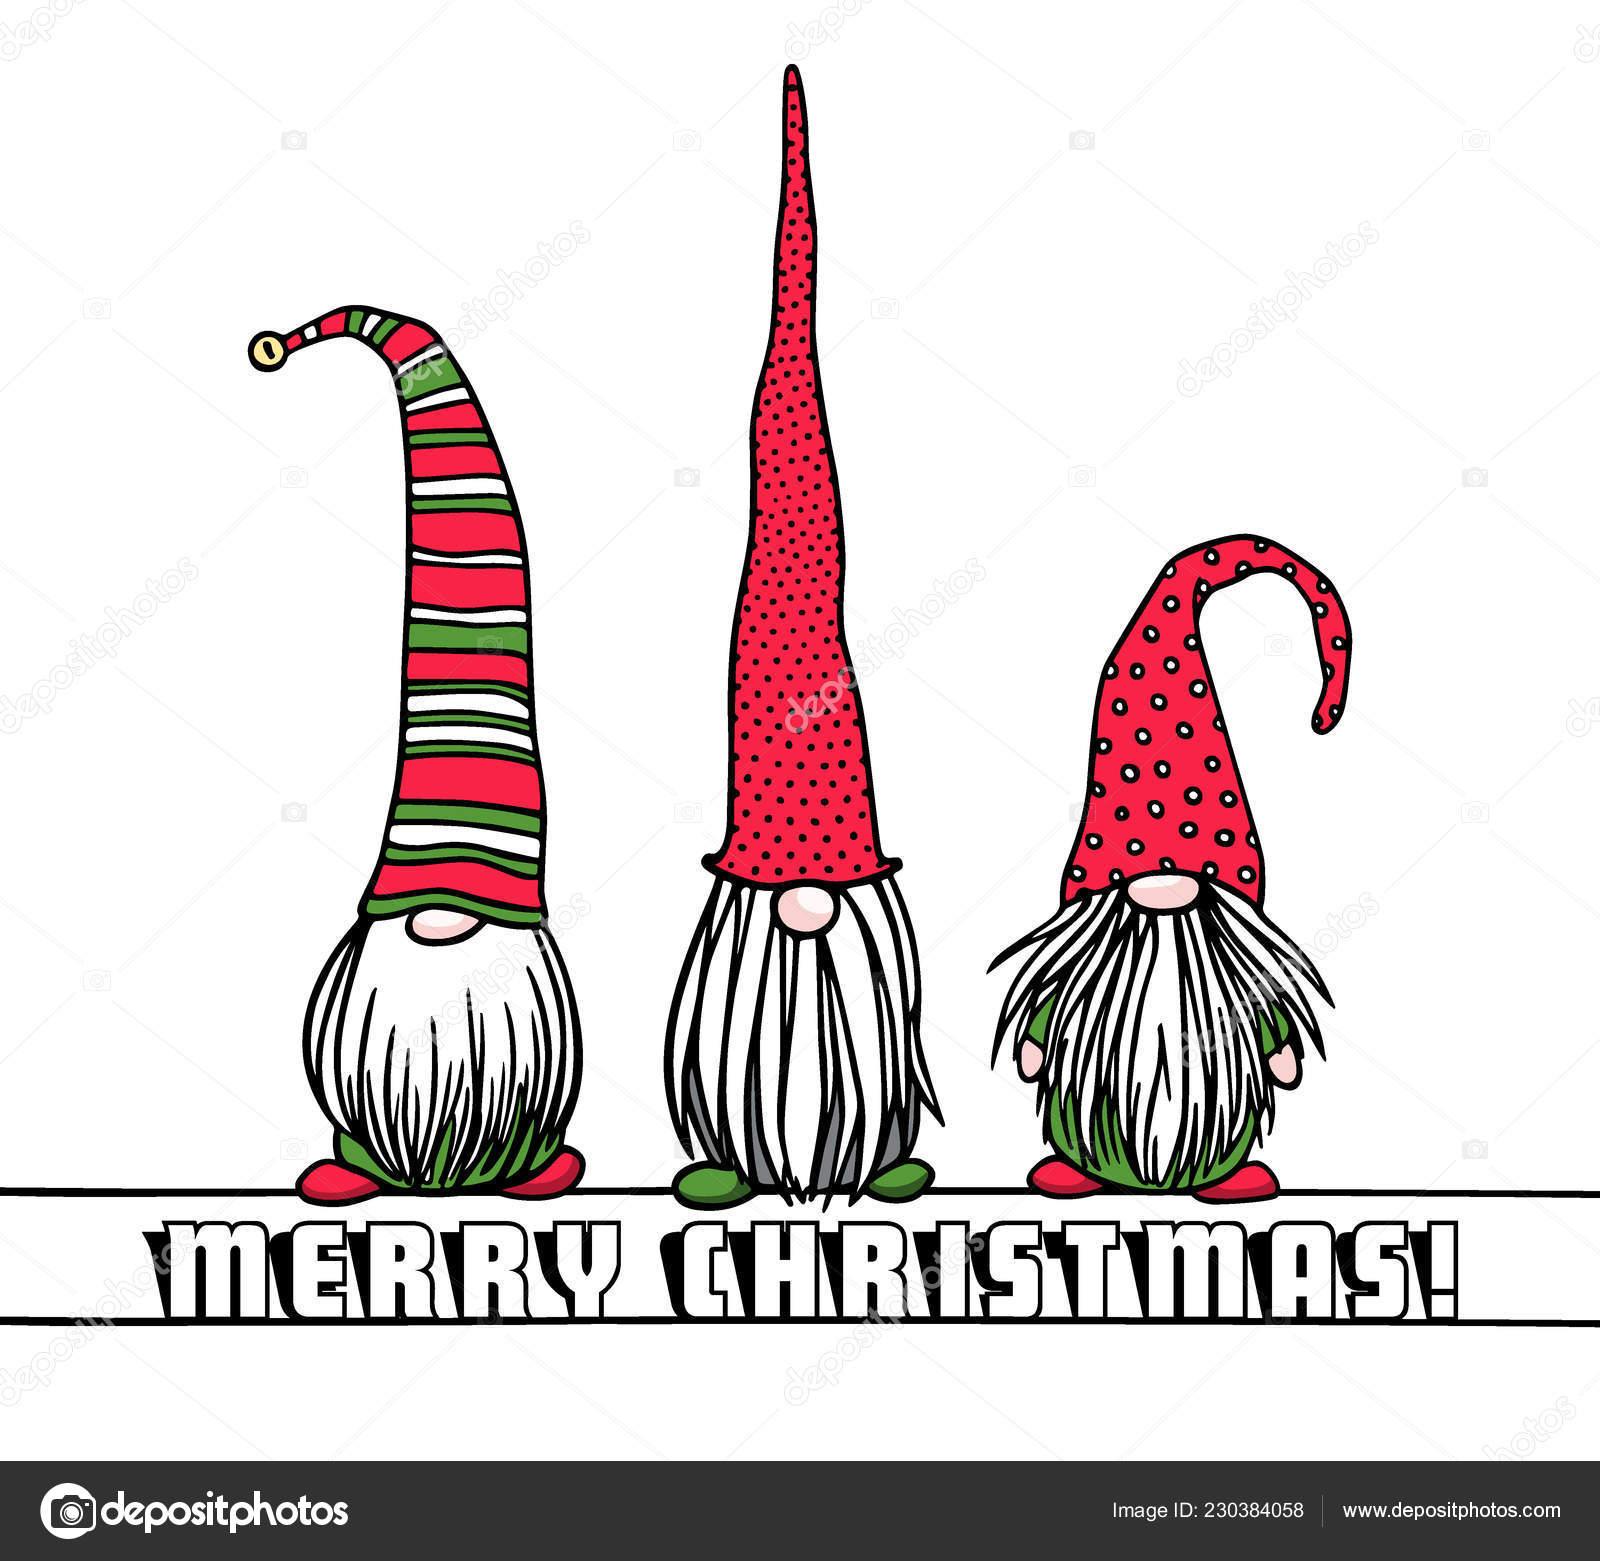 Christmas Gnomes Clipart.Hand Drawn Christmas Gnomes Stock Vector C Ezhevica 230384058